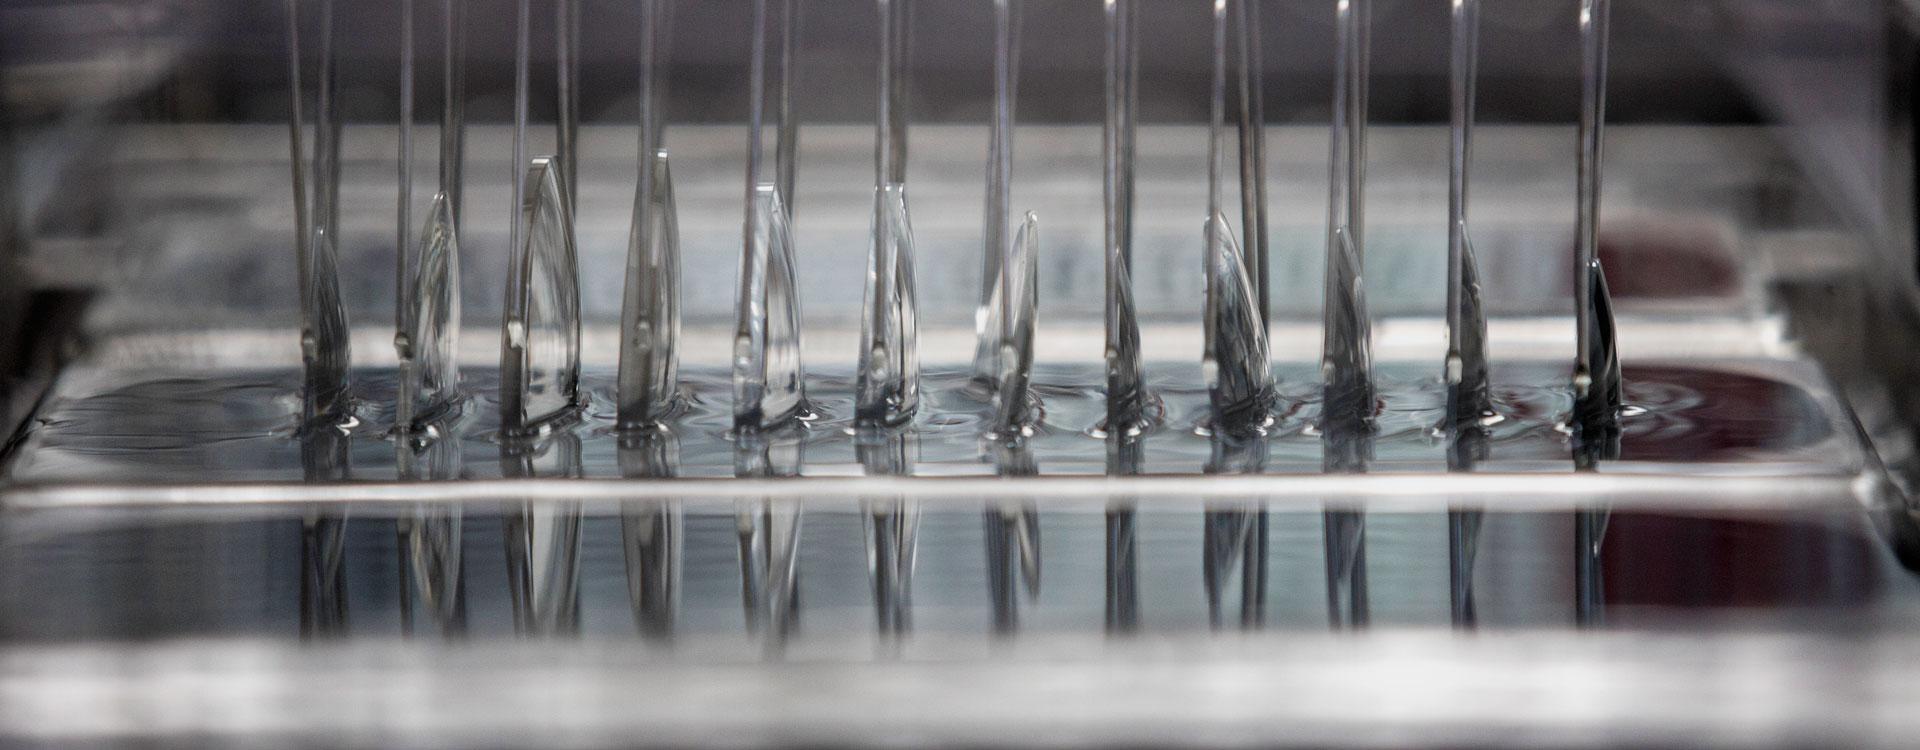 Karamouzis Optical Group UV filtering process